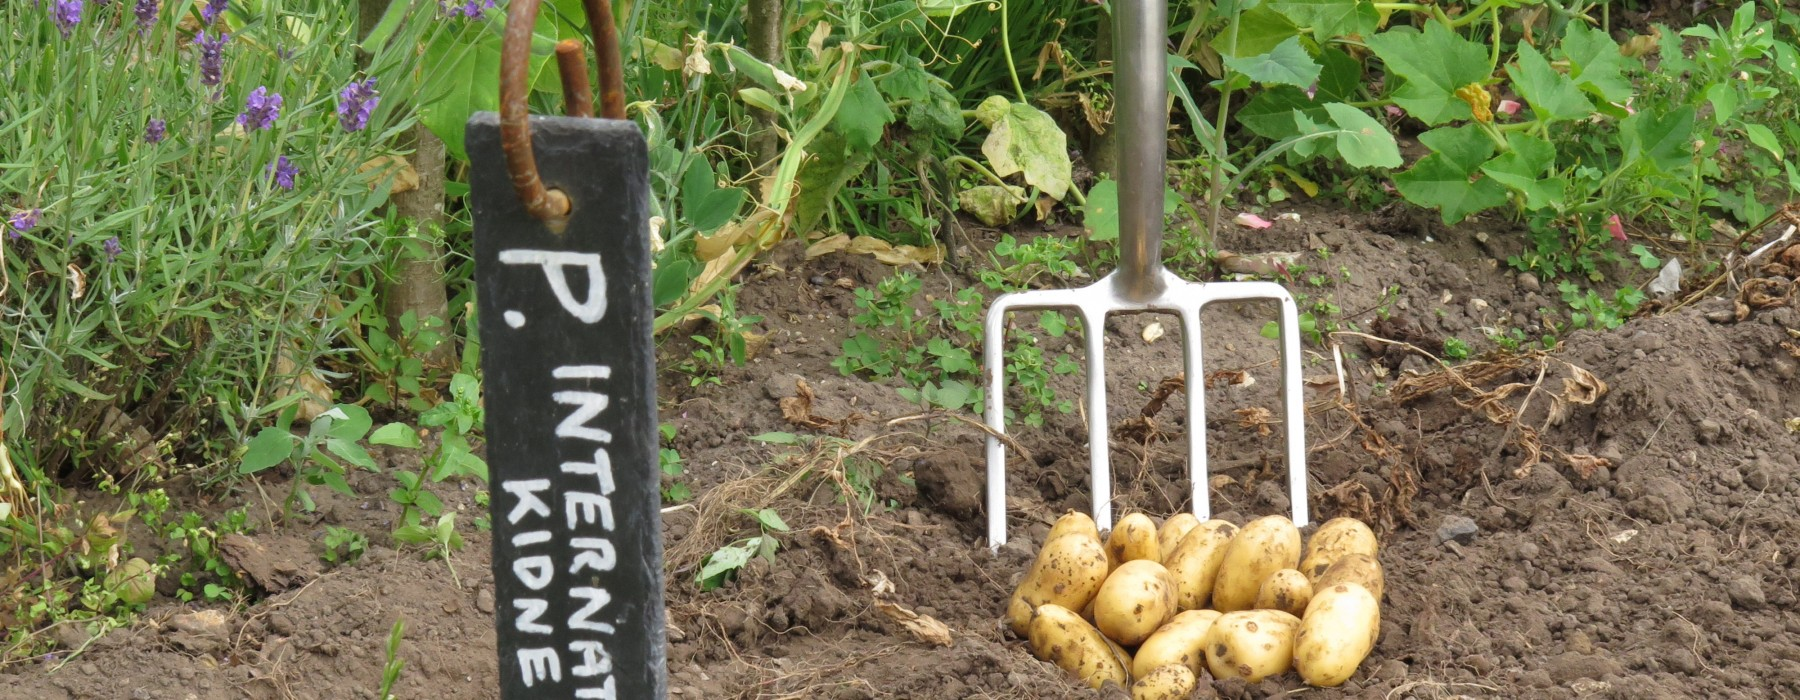 Homegrown Potatoes!